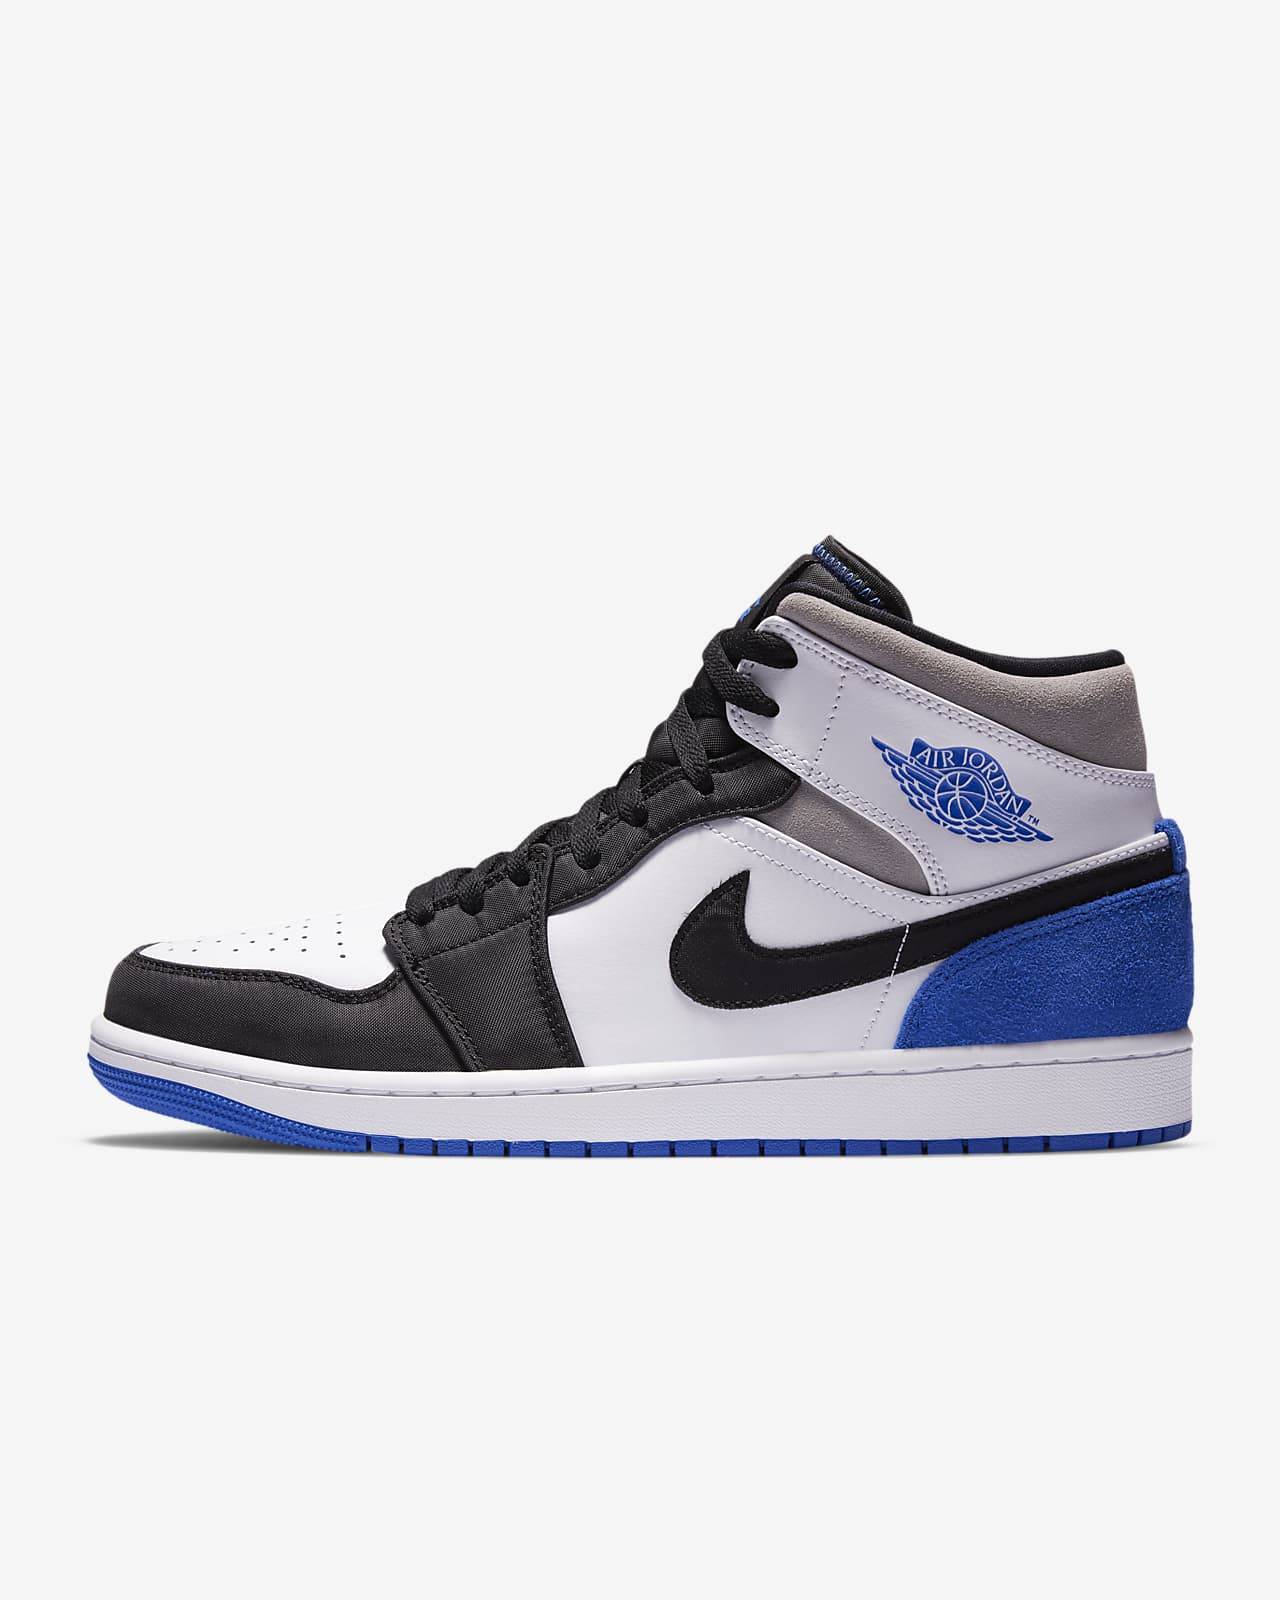 air jordan 1 mid azules y blancas